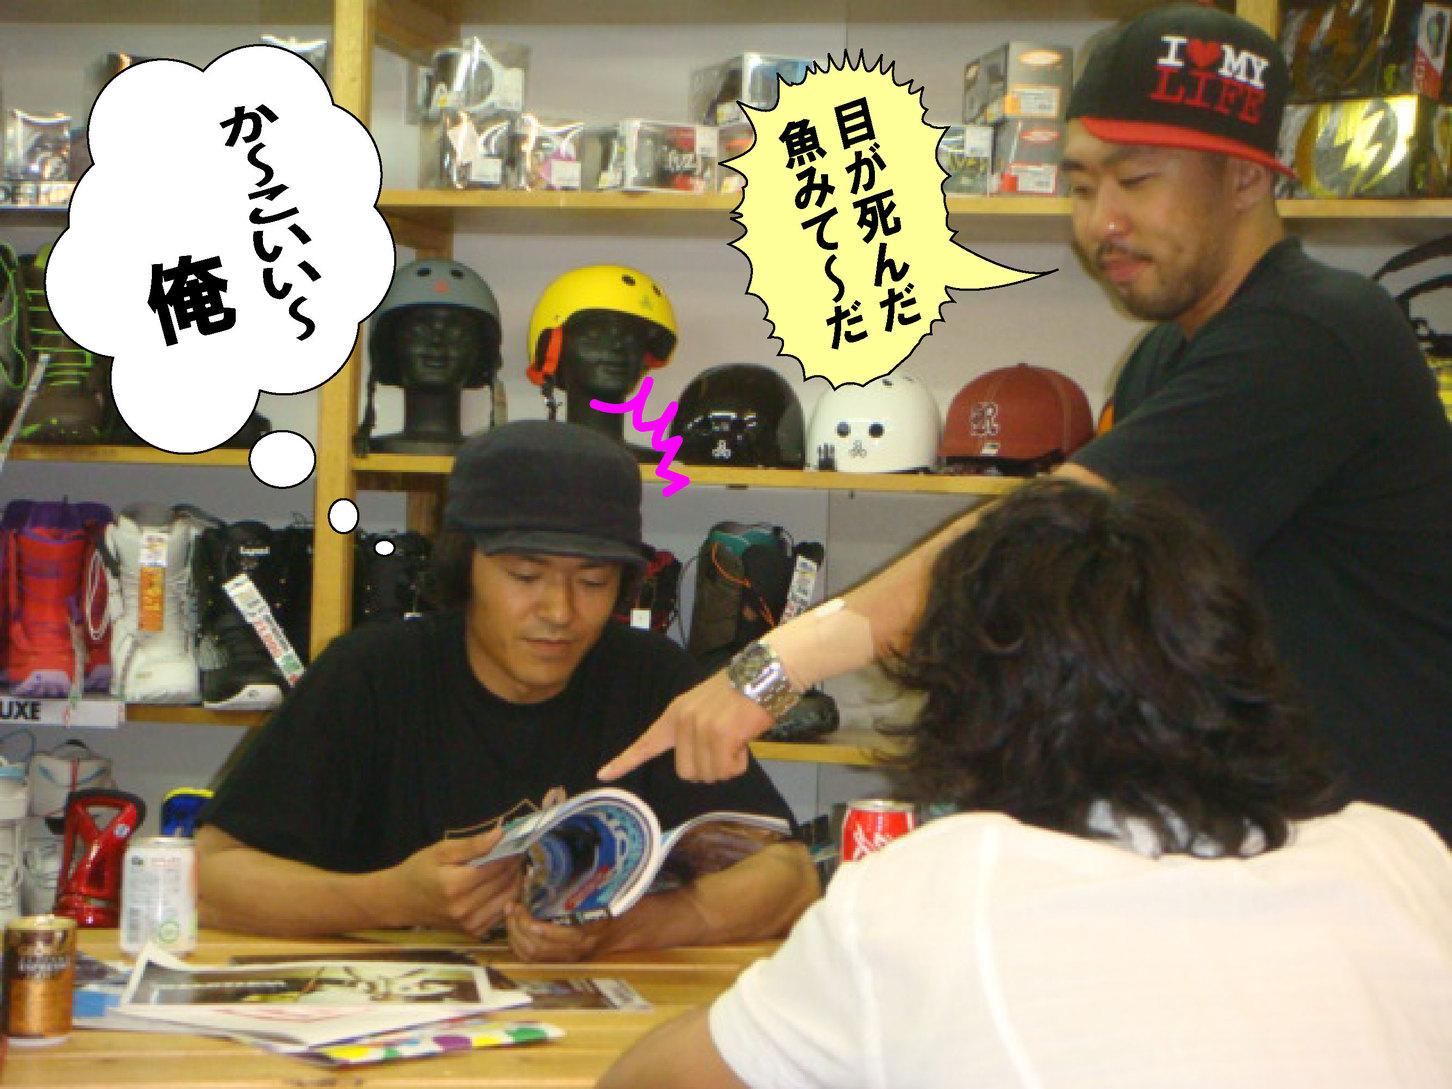 snowboarderカタログが発売されました!_f0229217_857466.jpg